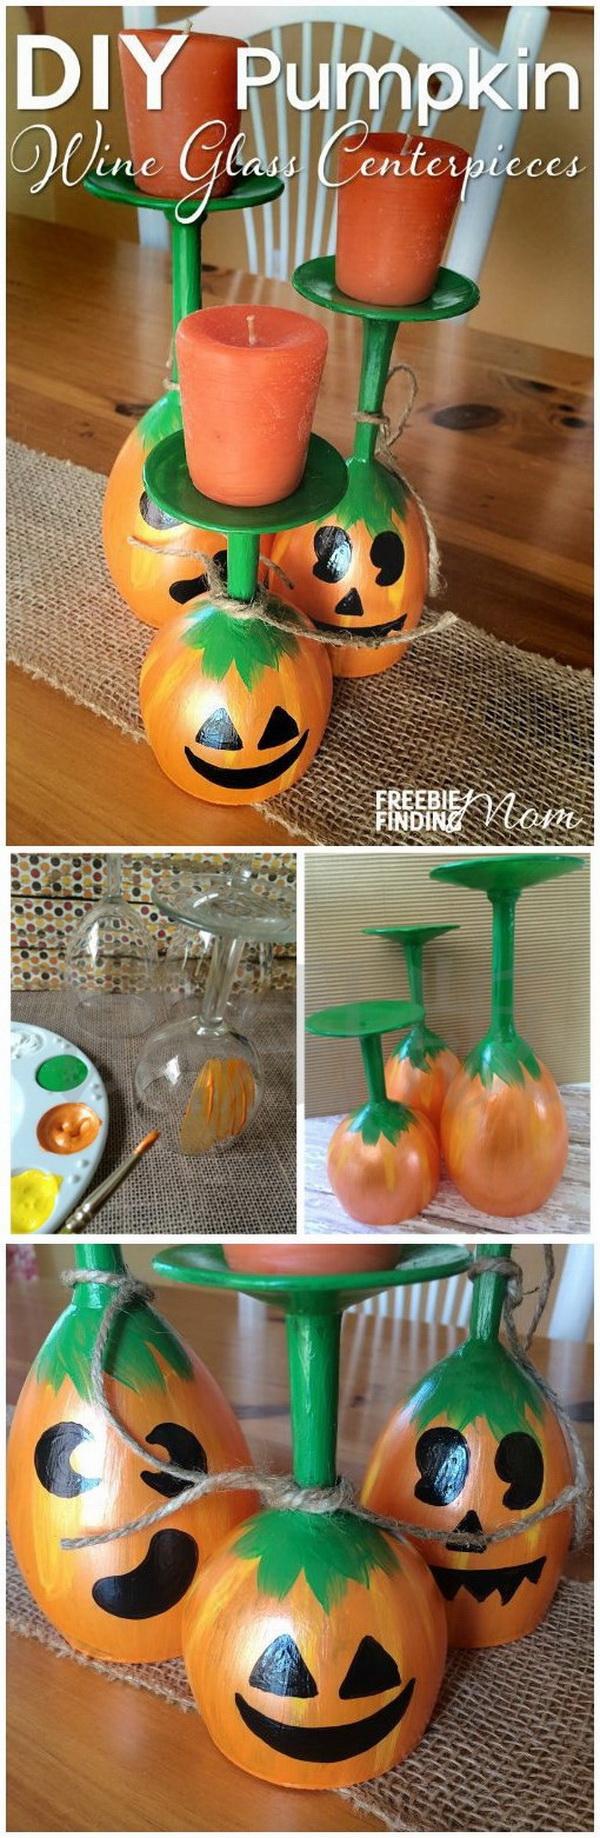 DIY Halloween Decorating Projects: DIY Pumpkin Wine Glass Centerpieces.